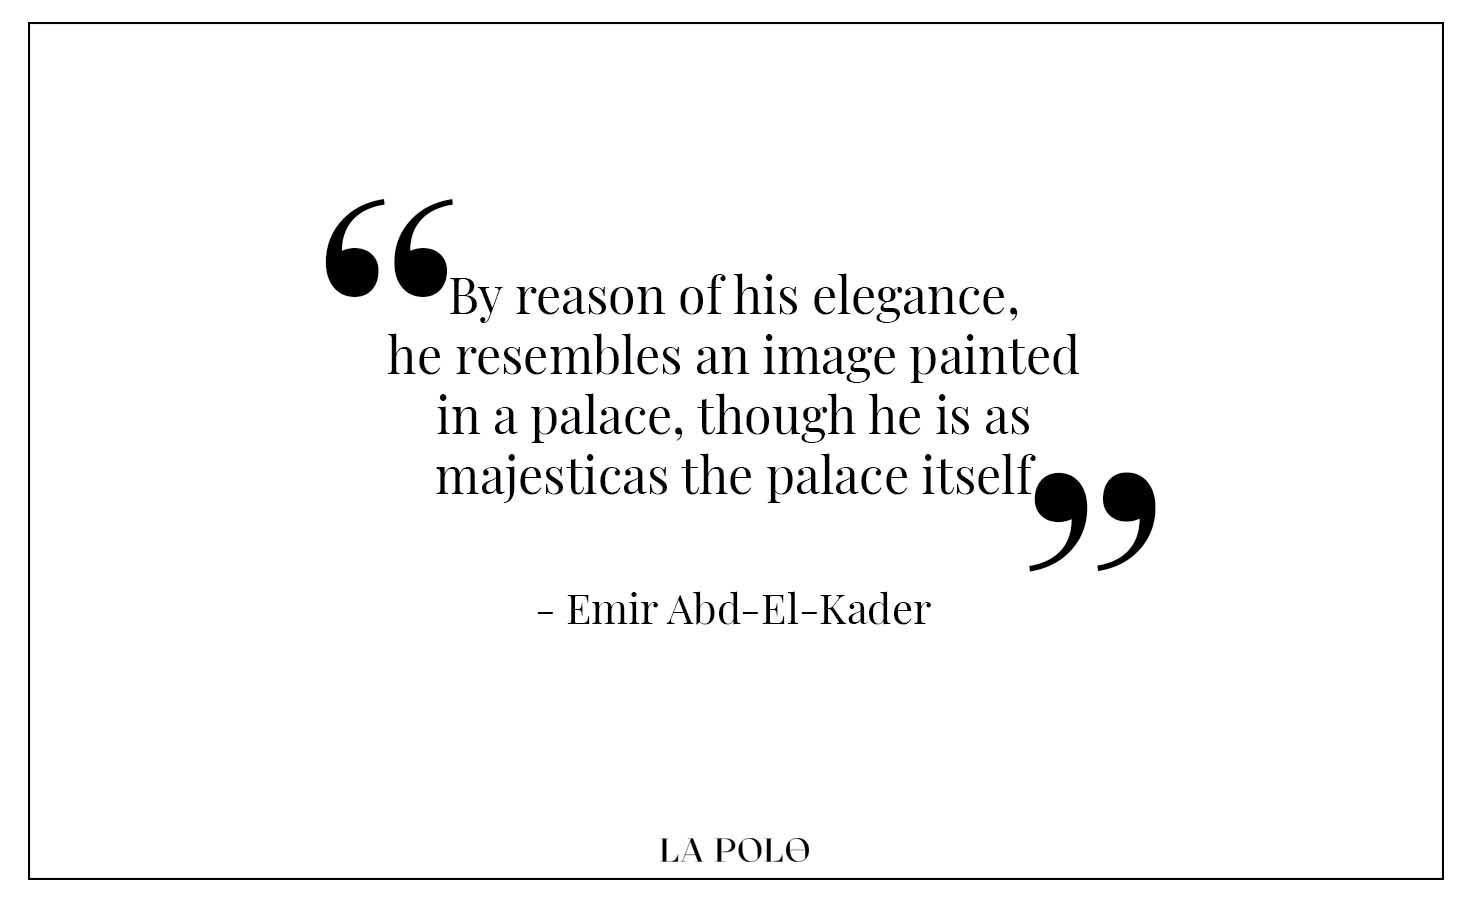 Emir Abd-El-Kader quotes